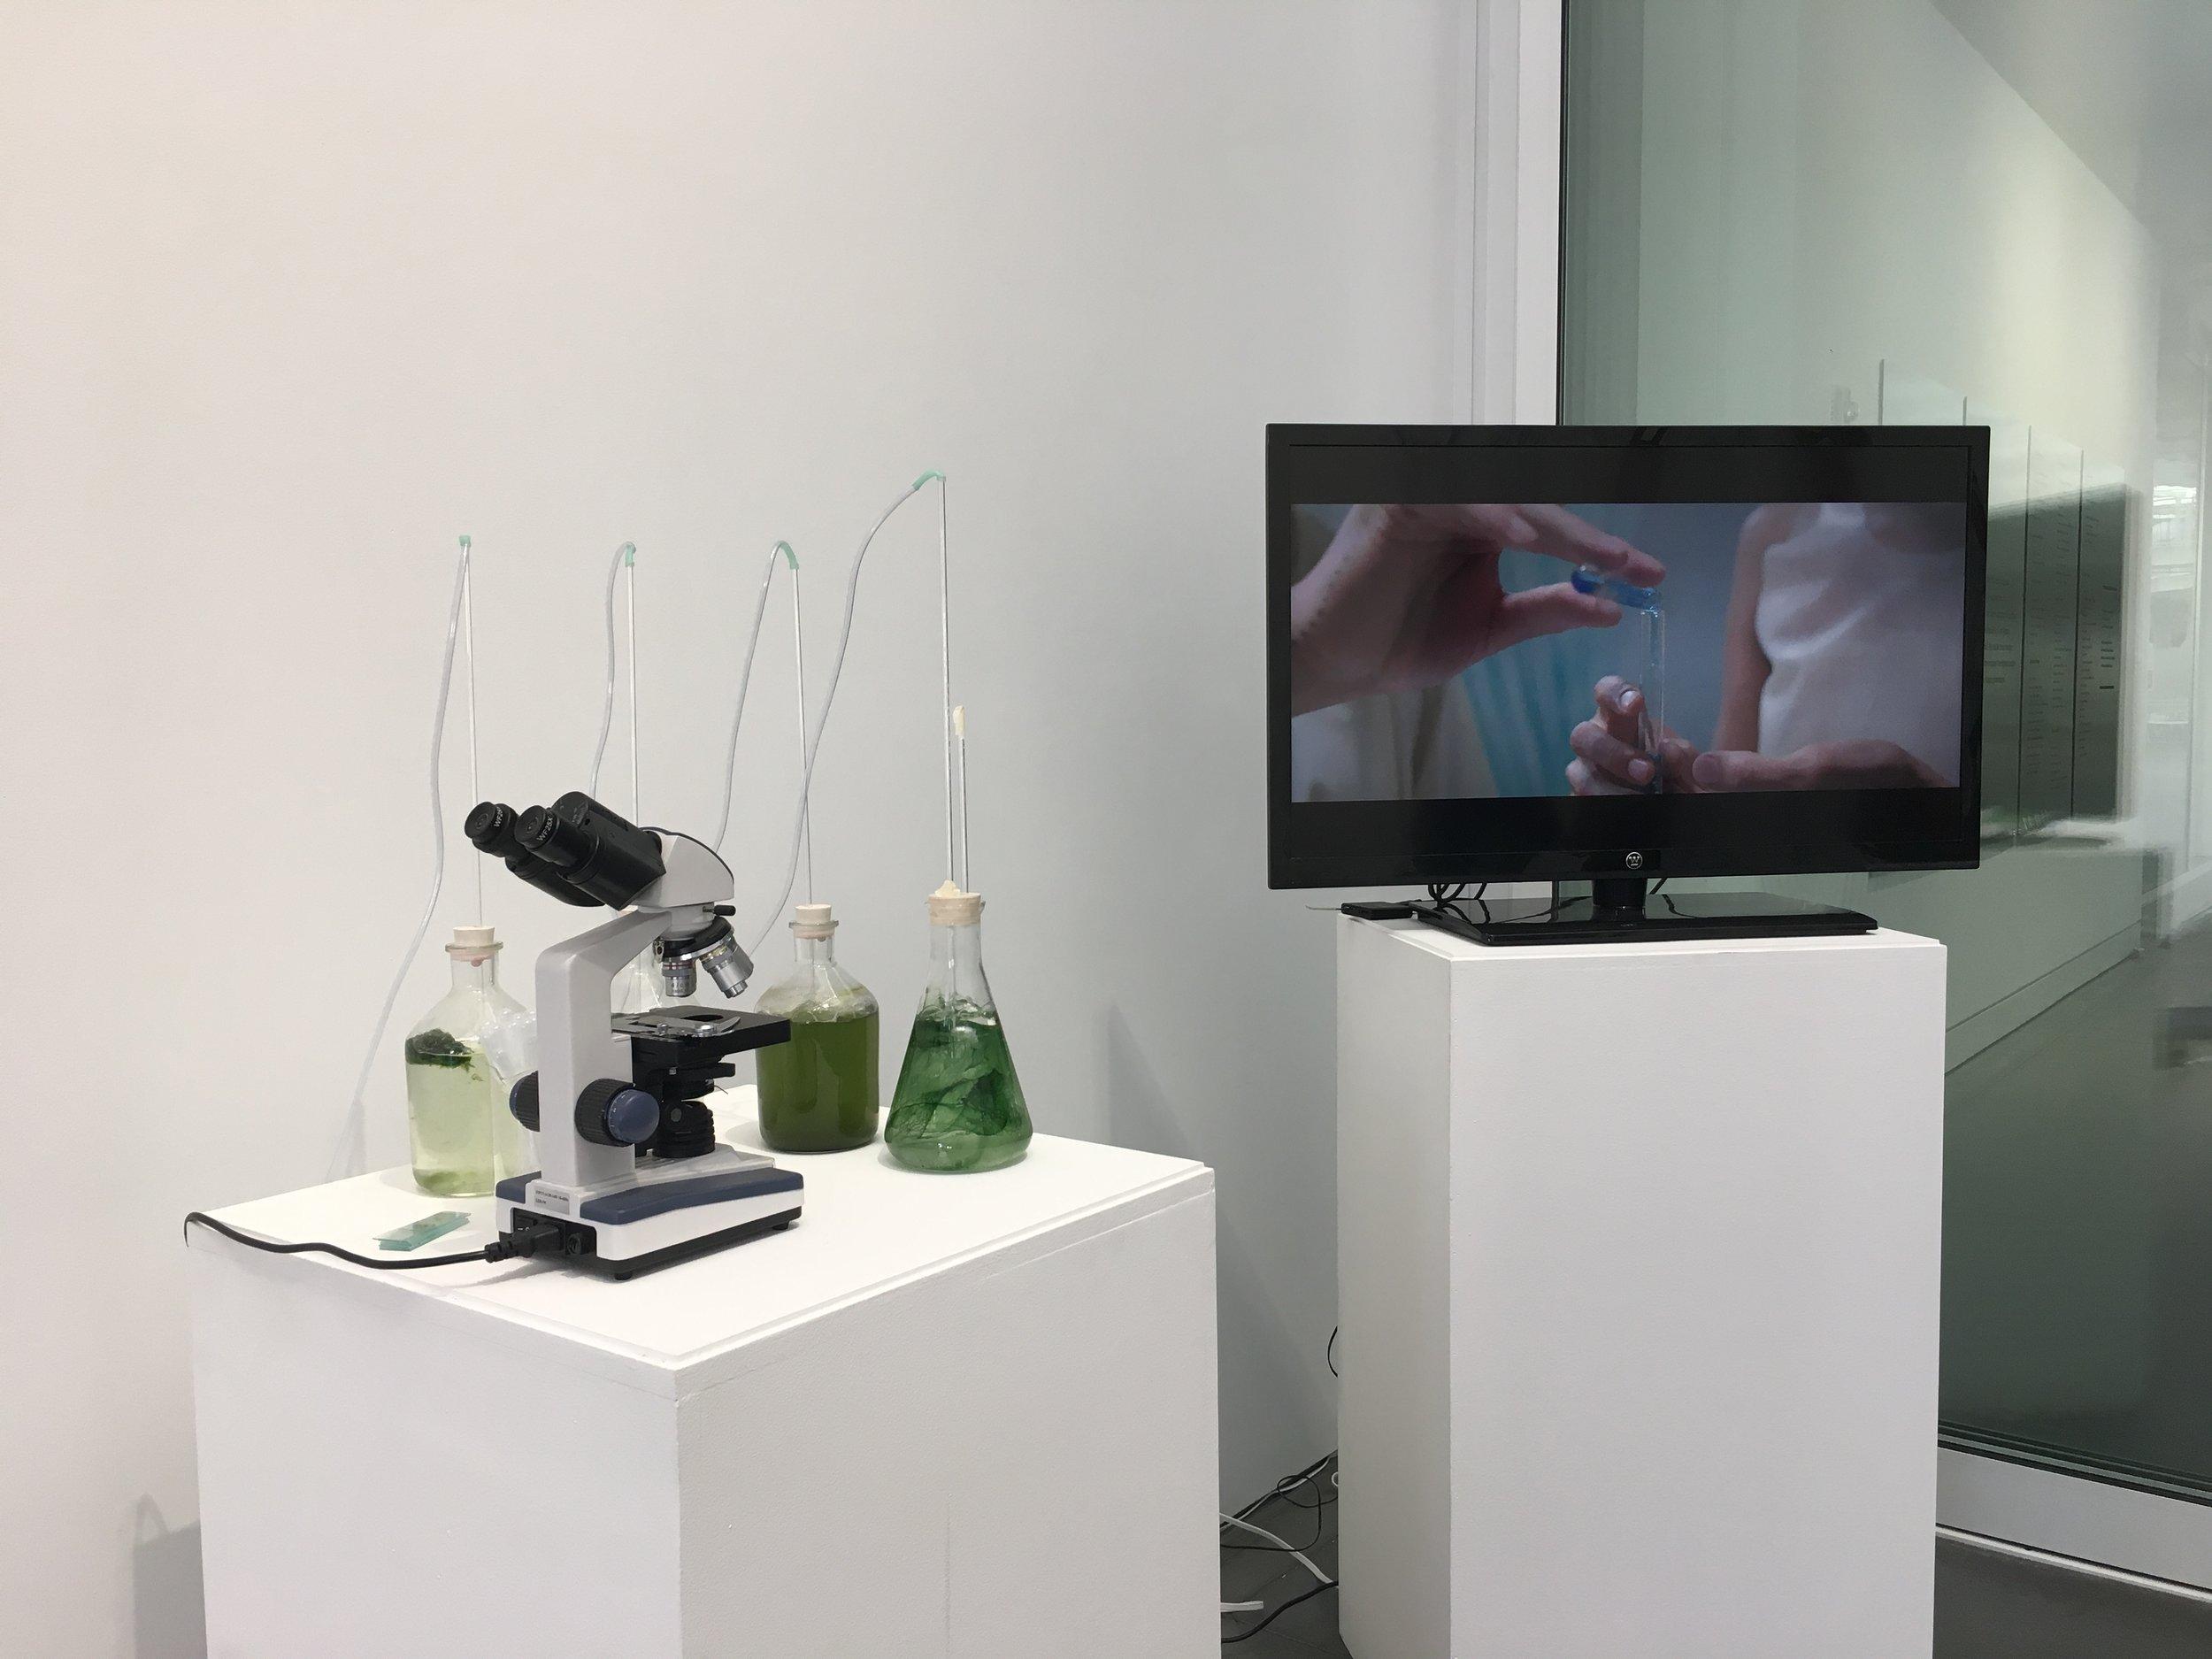 2nd exhibition of Cyanovisions at Leonardo's 50th Anniversary Celebration at Fort Mason Center in San Francisco